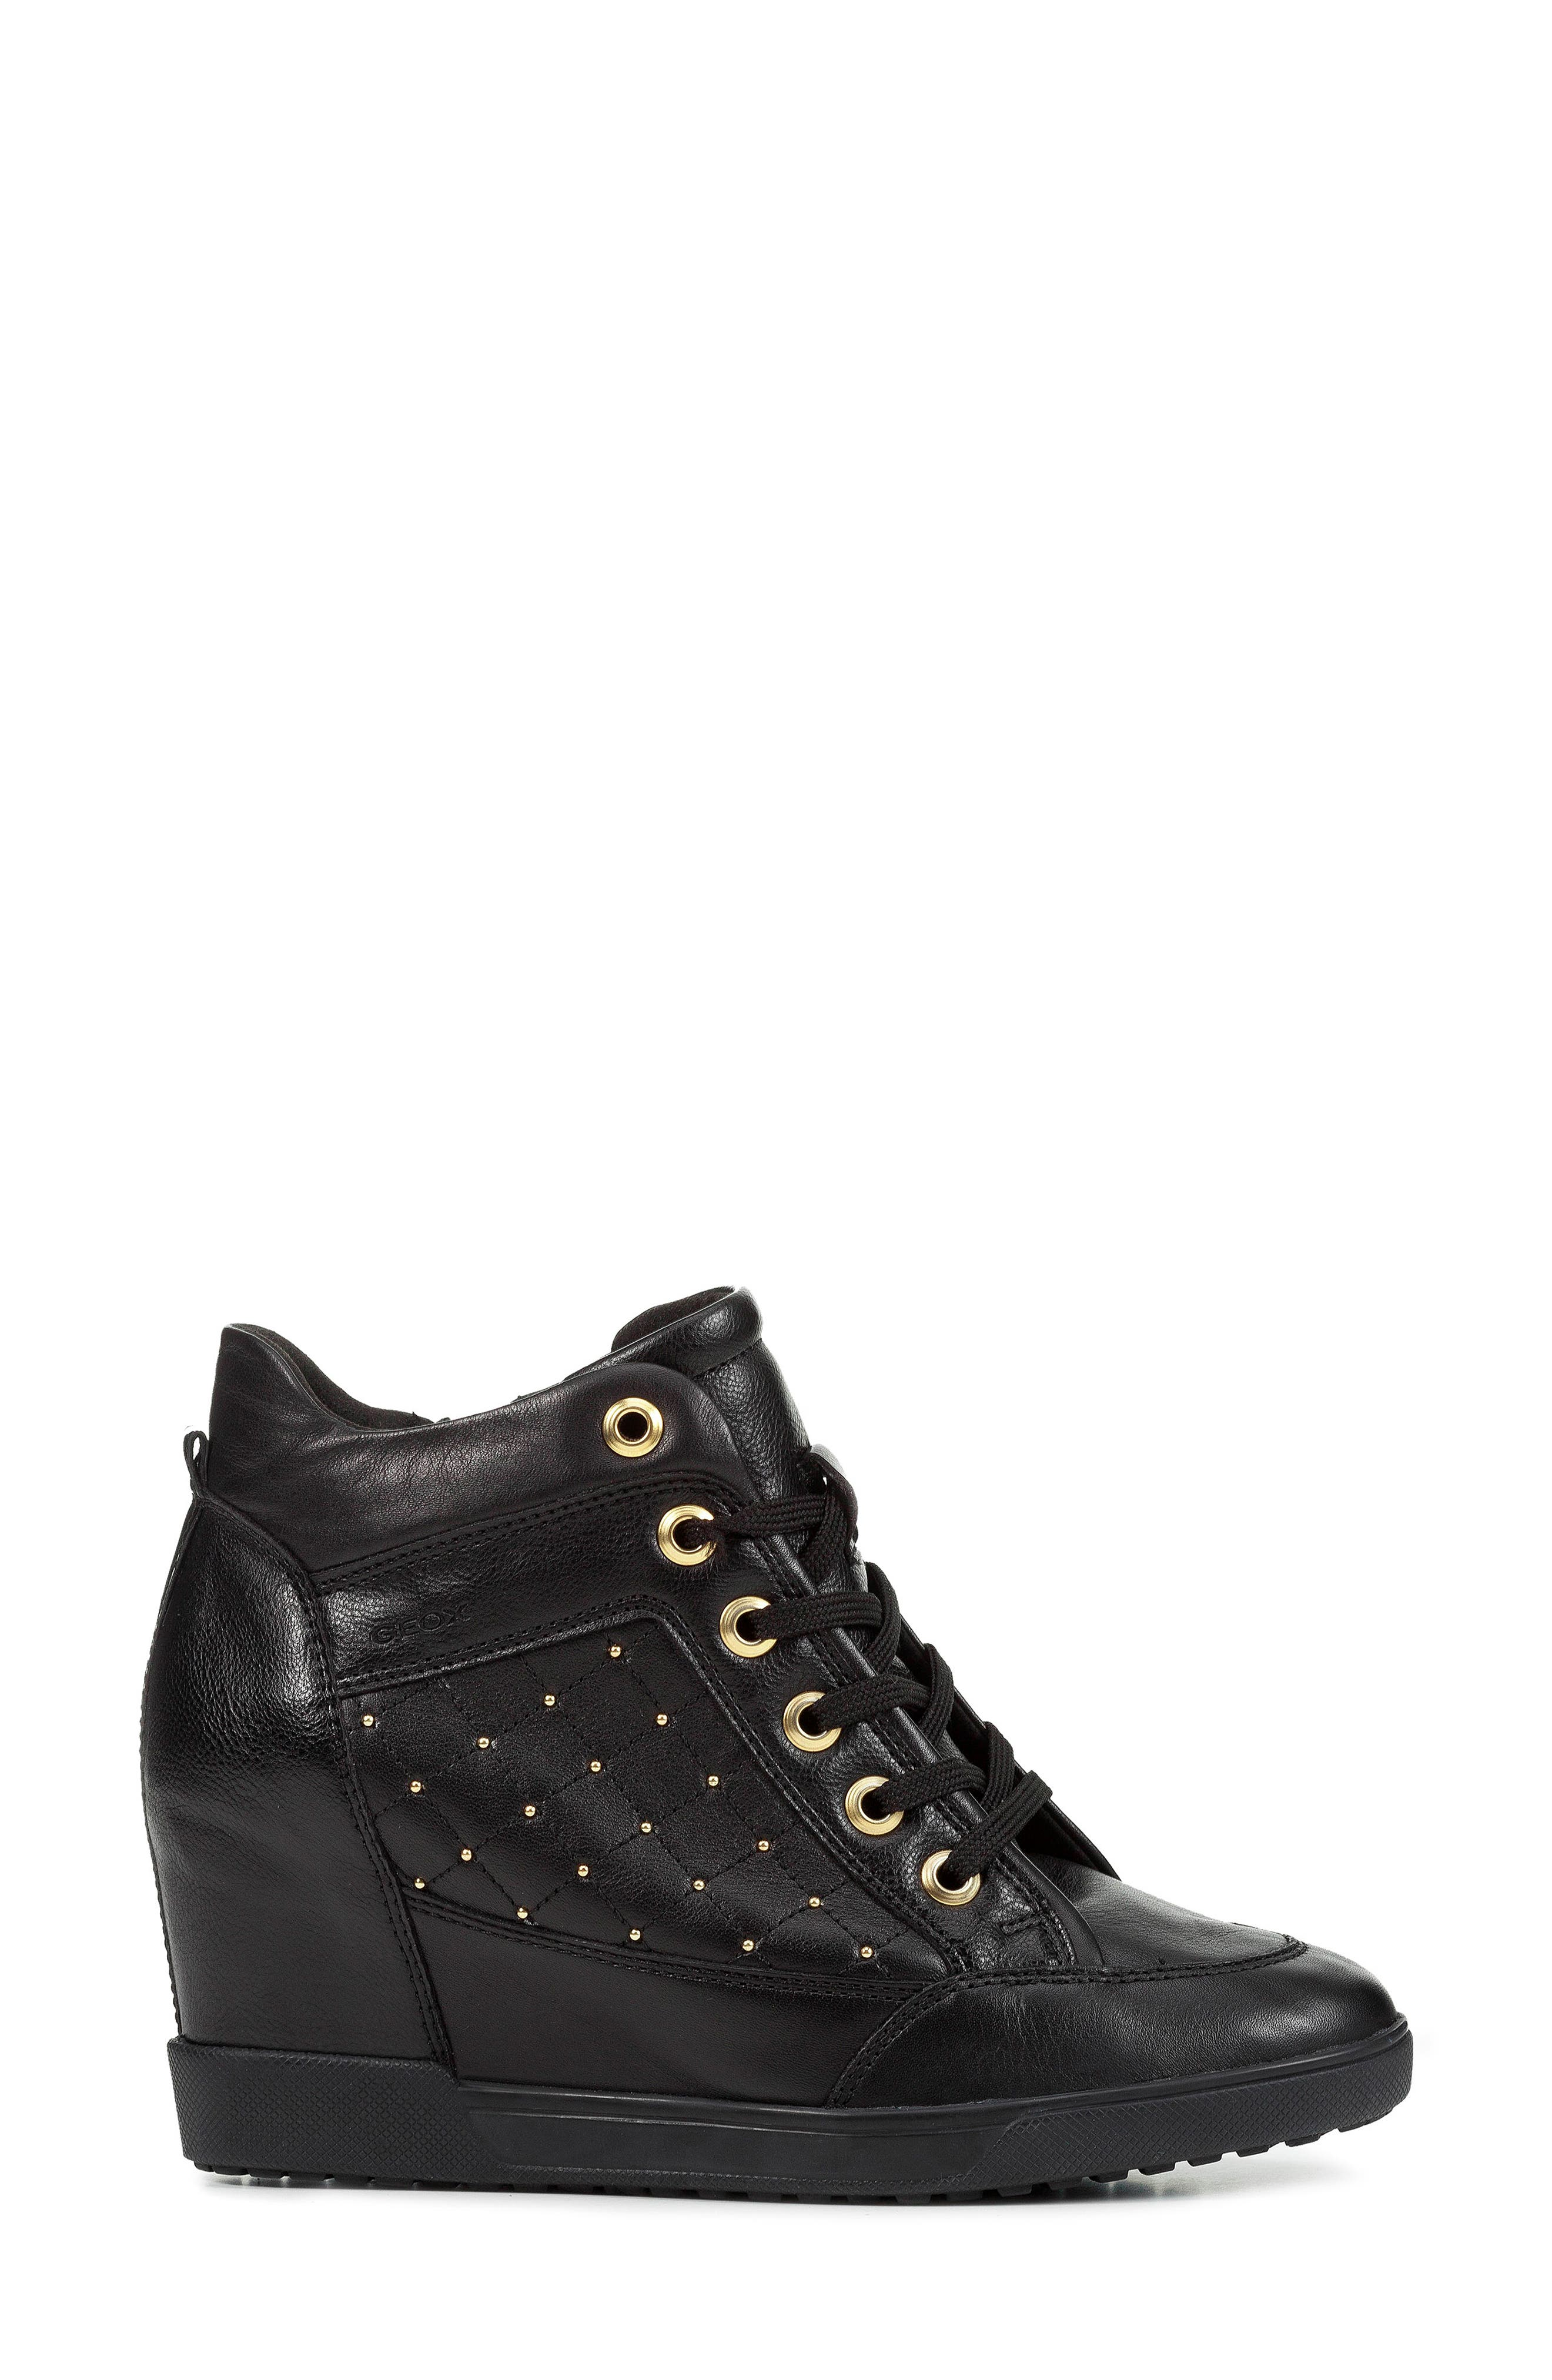 GEOX, Carum Wedge Sneaker, Alternate thumbnail 3, color, 001